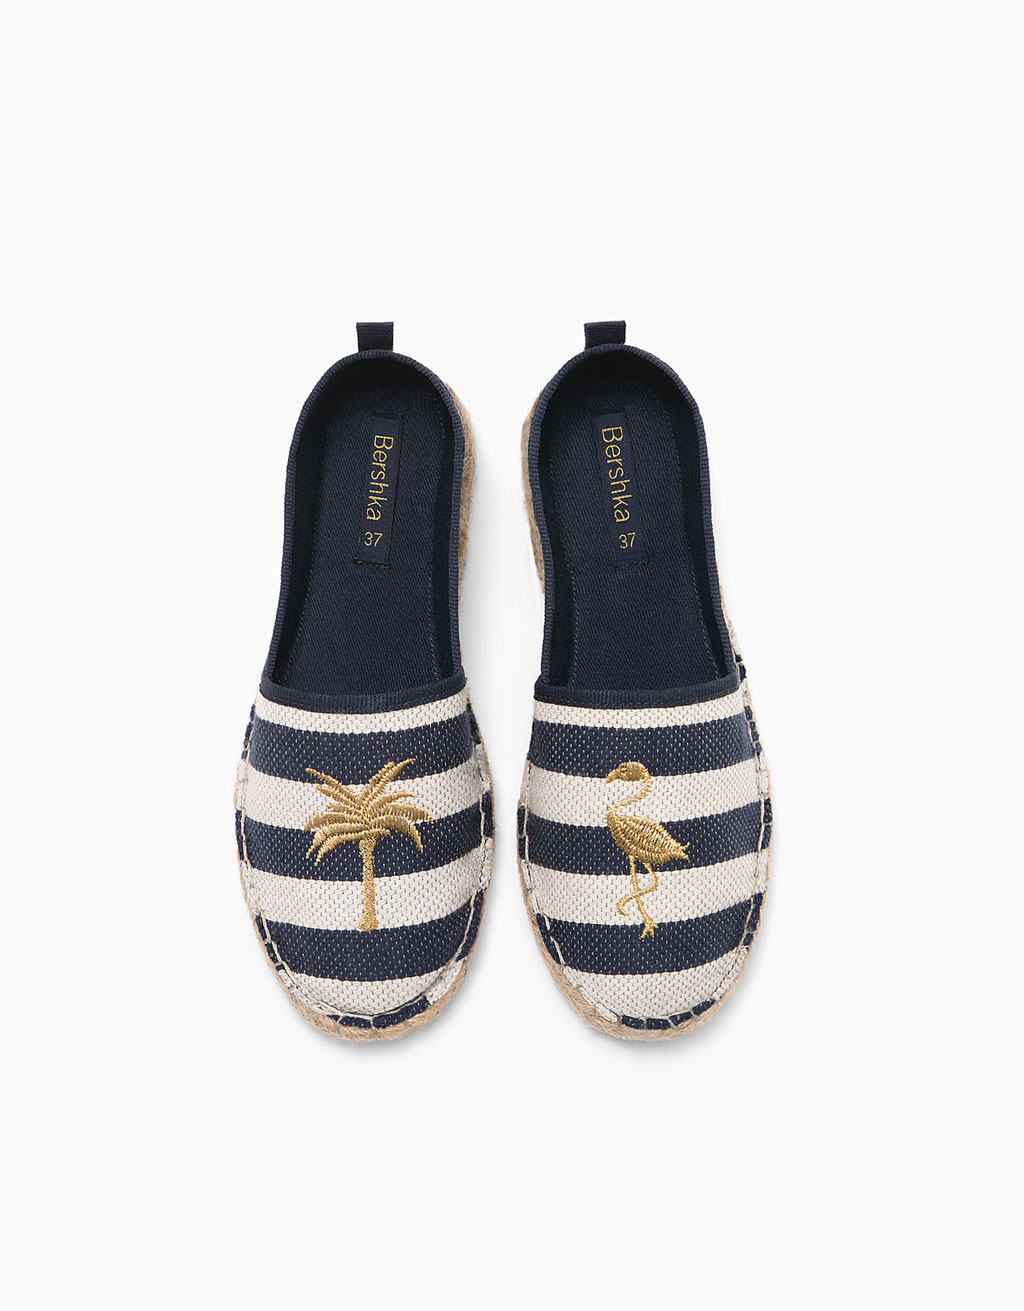 Striped fabric jute sandals